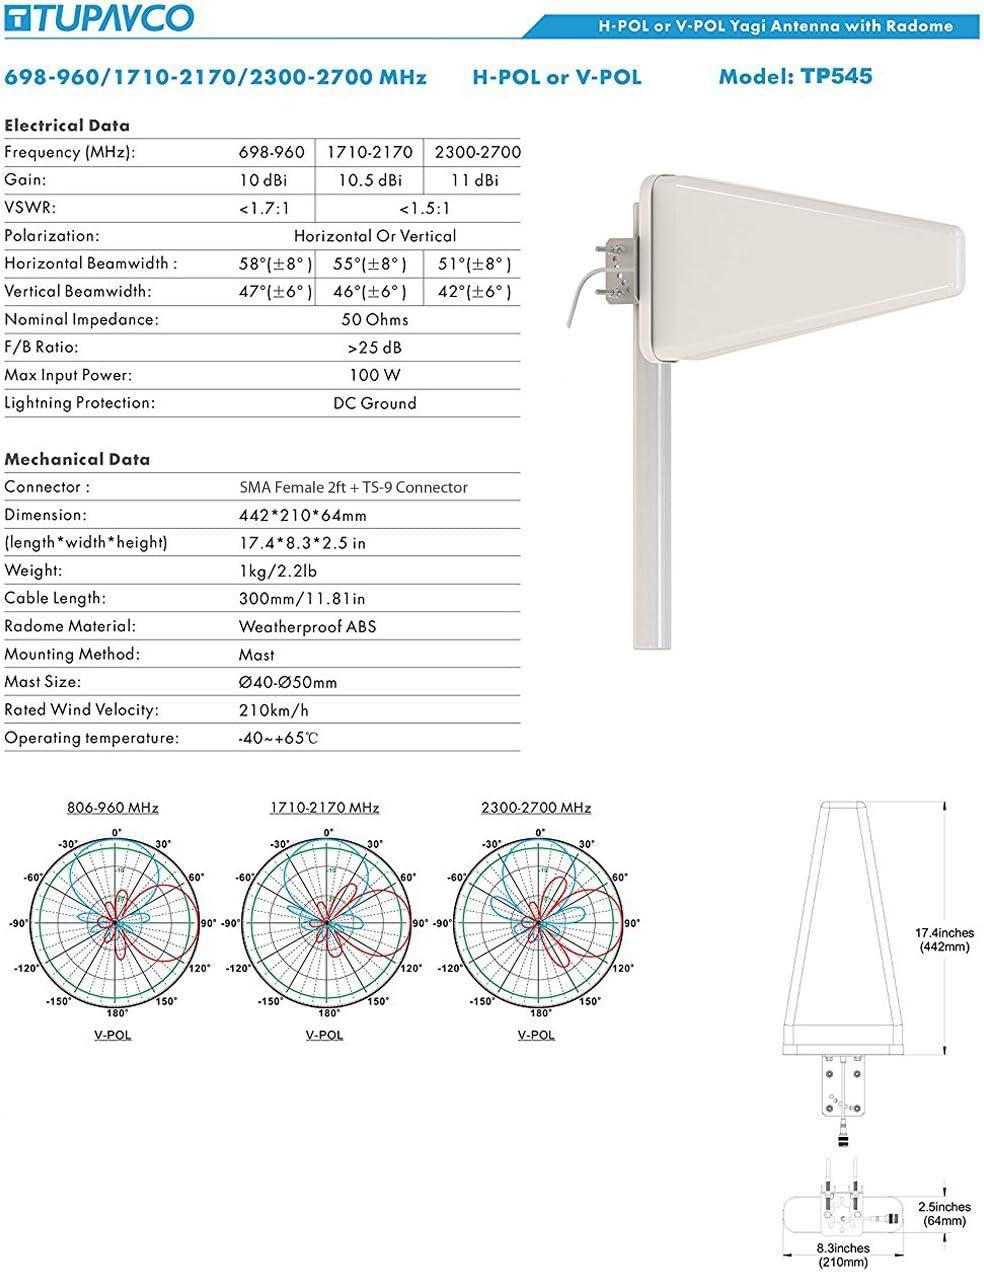 Tupavco TP545 Yagi direccional Roof Antena 3G 4G LTE Wide Band 11dBi 2FT Cable w Hombre Cable 2FT RP-SMA a TS-9 Adaptador señal del teléfono Celular ...